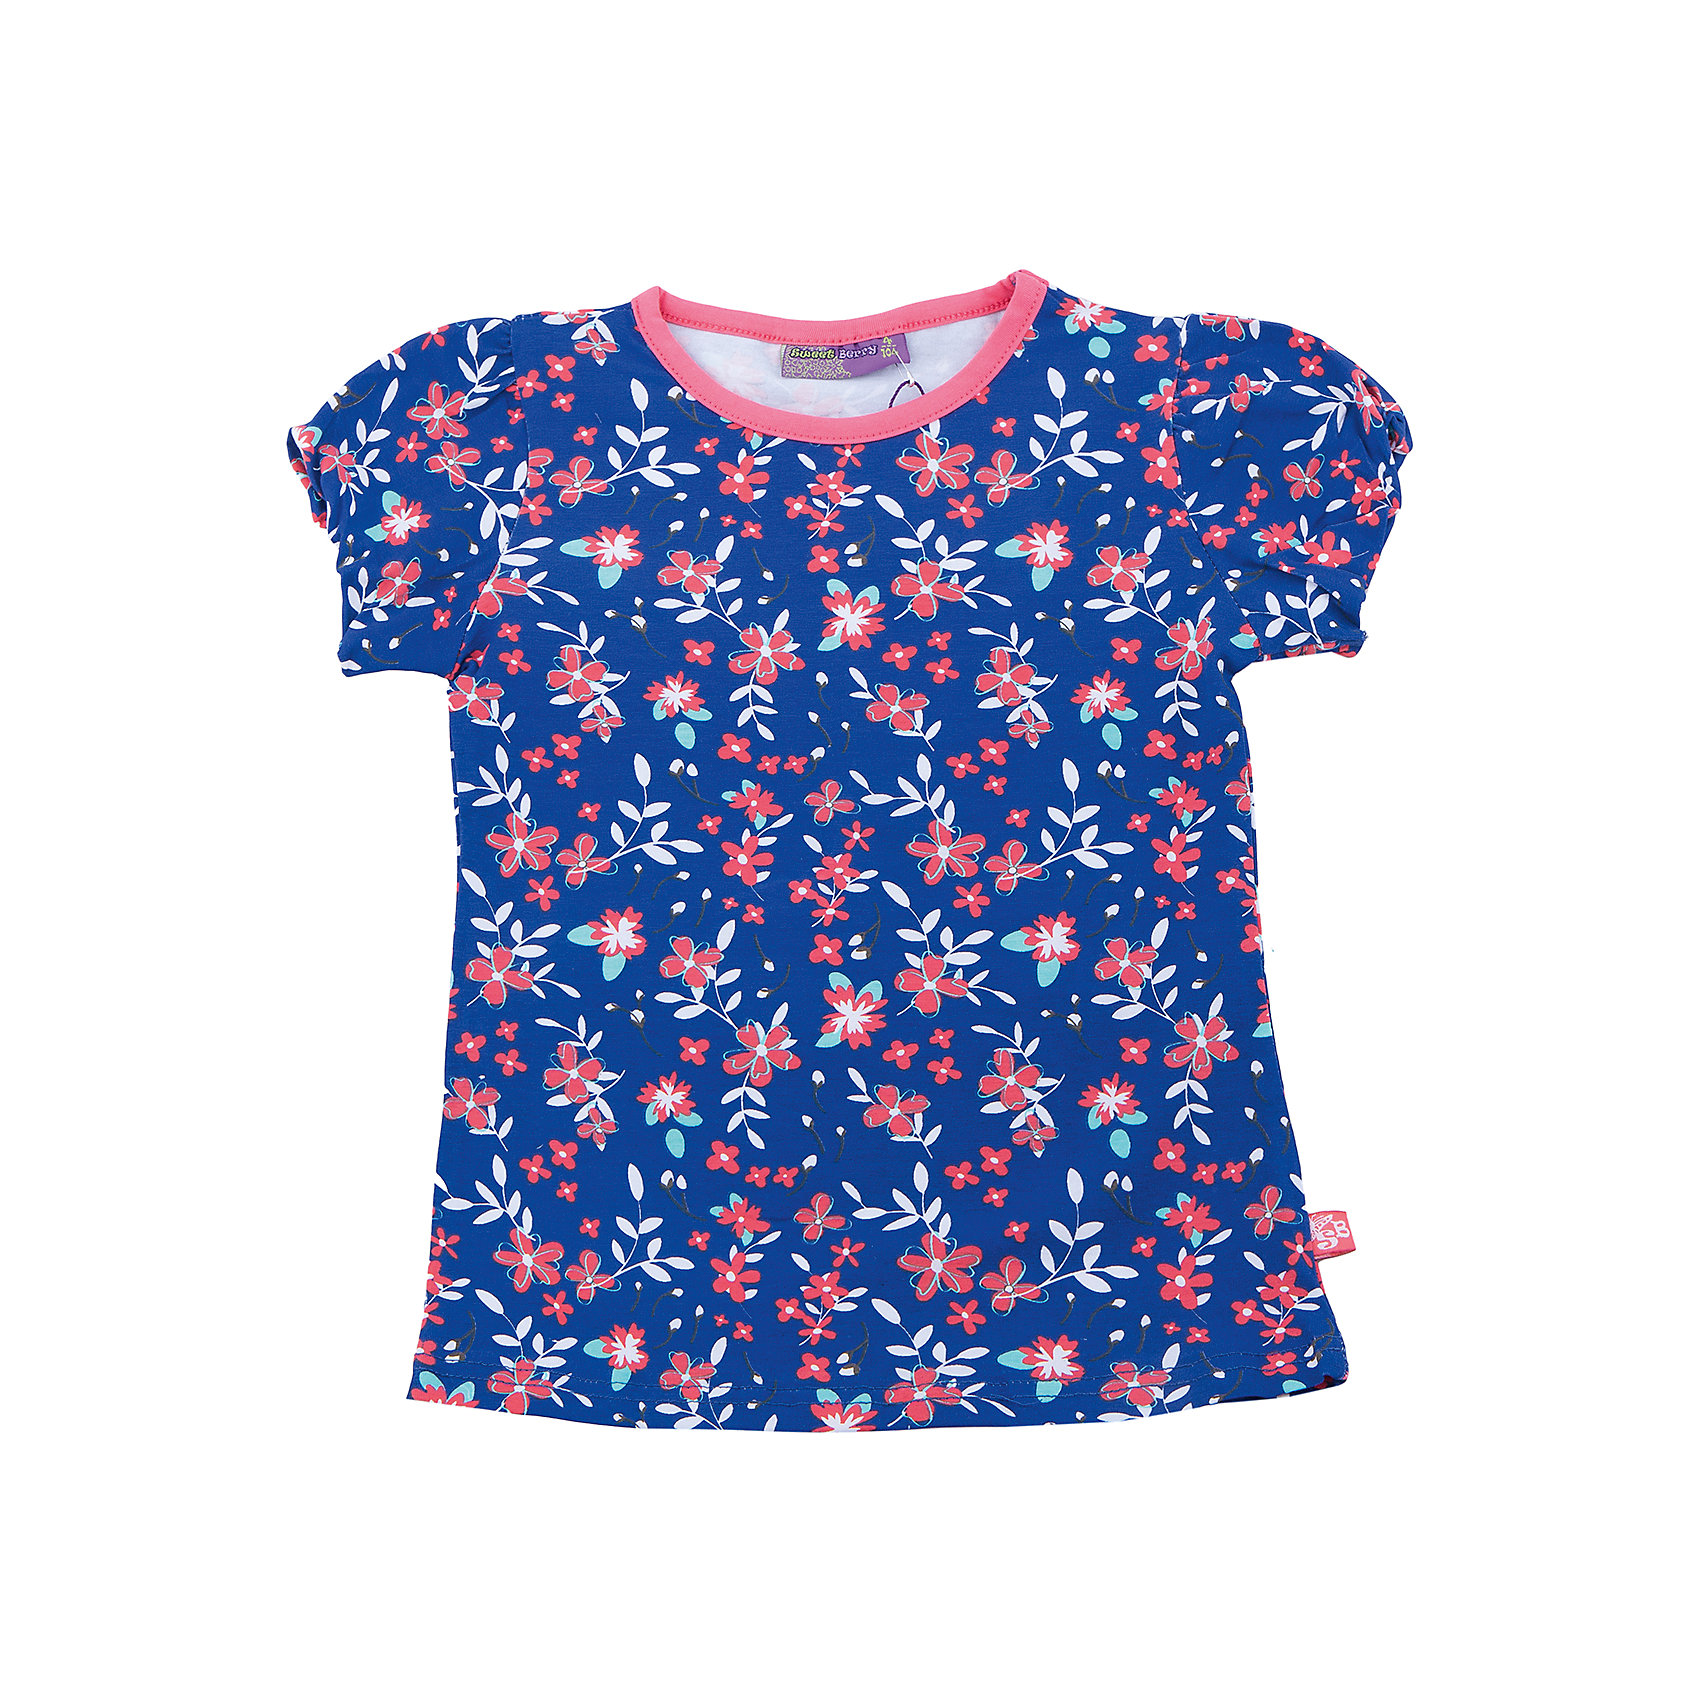 Футболка для девочки Sweet BerryТрикотажная футболка для девочки с цветочным принтом. Приталенный крой. Короткие рукава.<br>Состав:<br>95%хлопок 5%эластан<br><br>Ширина мм: 199<br>Глубина мм: 10<br>Высота мм: 161<br>Вес г: 151<br>Цвет: синий<br>Возраст от месяцев: 36<br>Возраст до месяцев: 48<br>Пол: Женский<br>Возраст: Детский<br>Размер: 104,98,110,116,122,128<br>SKU: 5412265